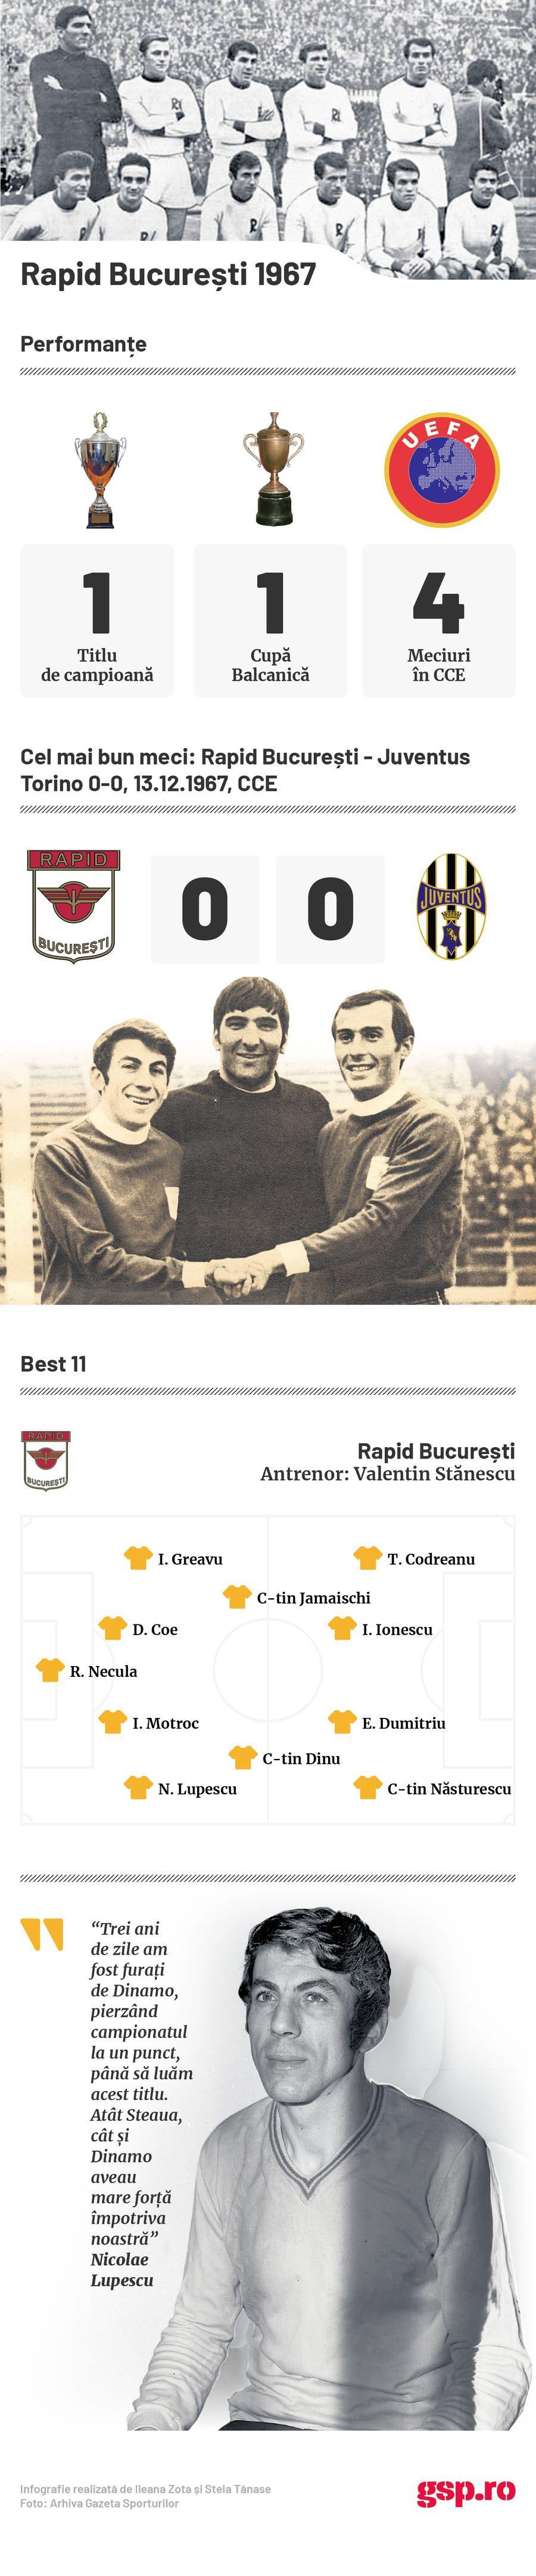 infografie Rapid 1967